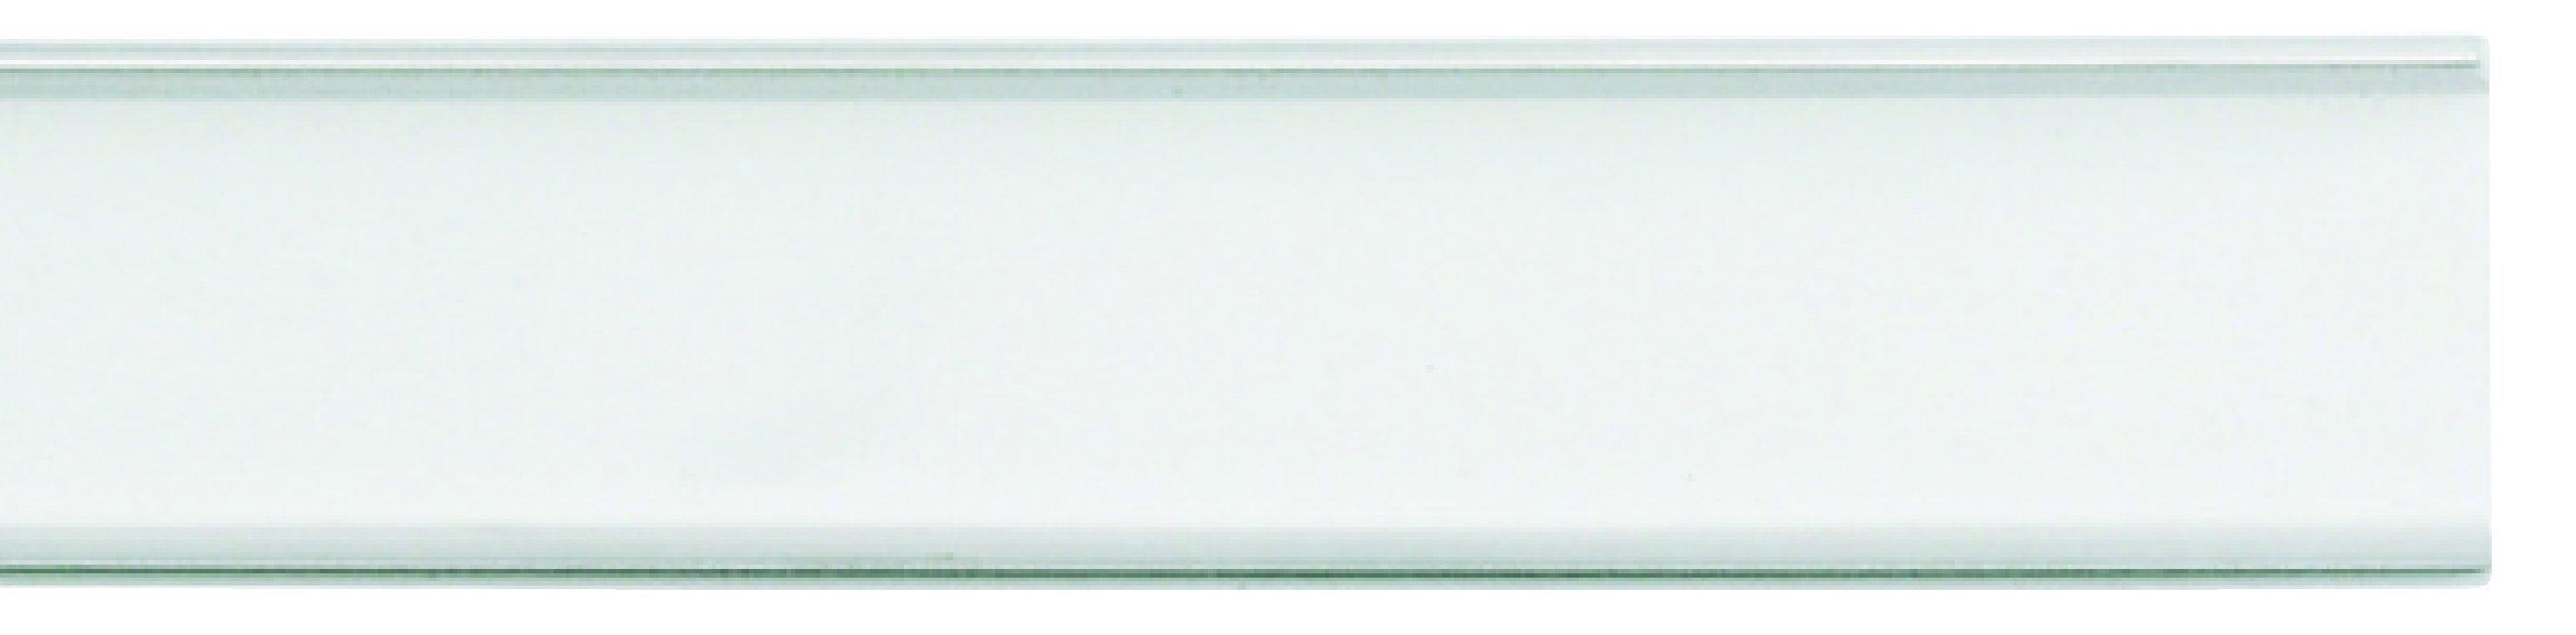 1 Stk Blindstreifen weiss IL900251-W